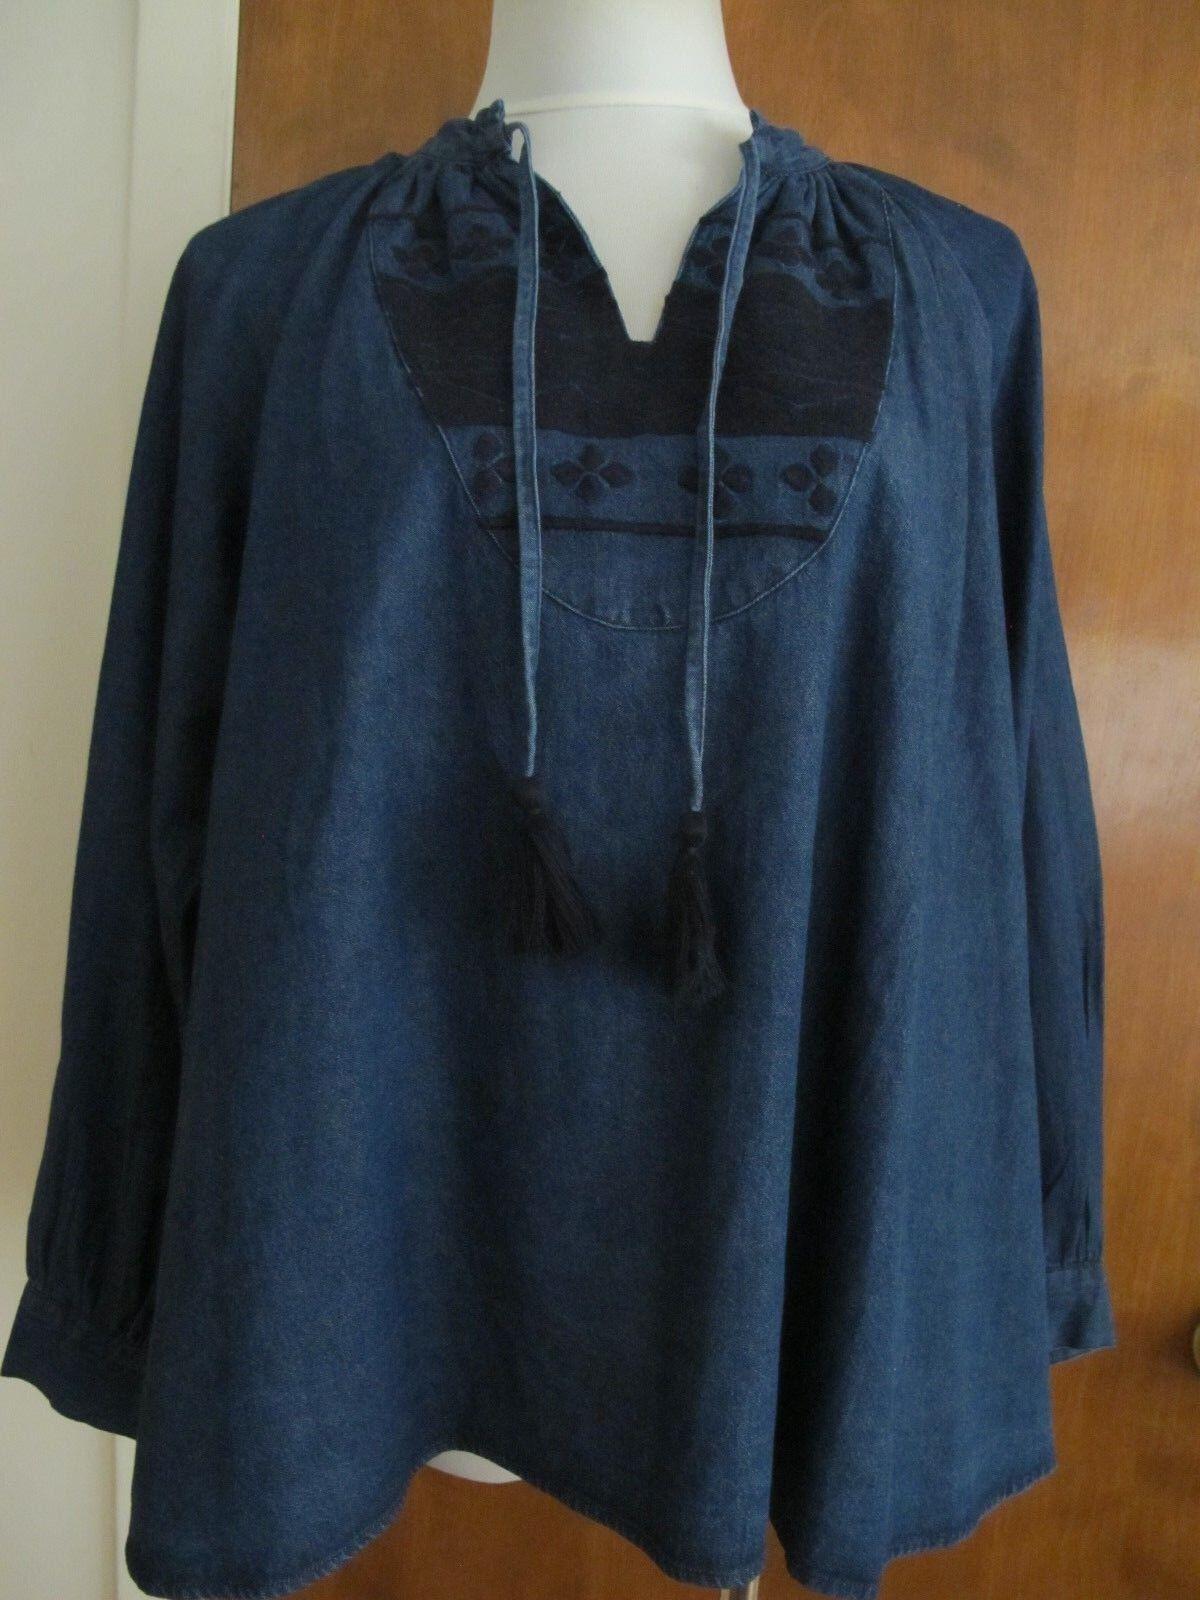 Anthropologie damen denim Blau detailed embroiderot A-line tunic top M L NWT